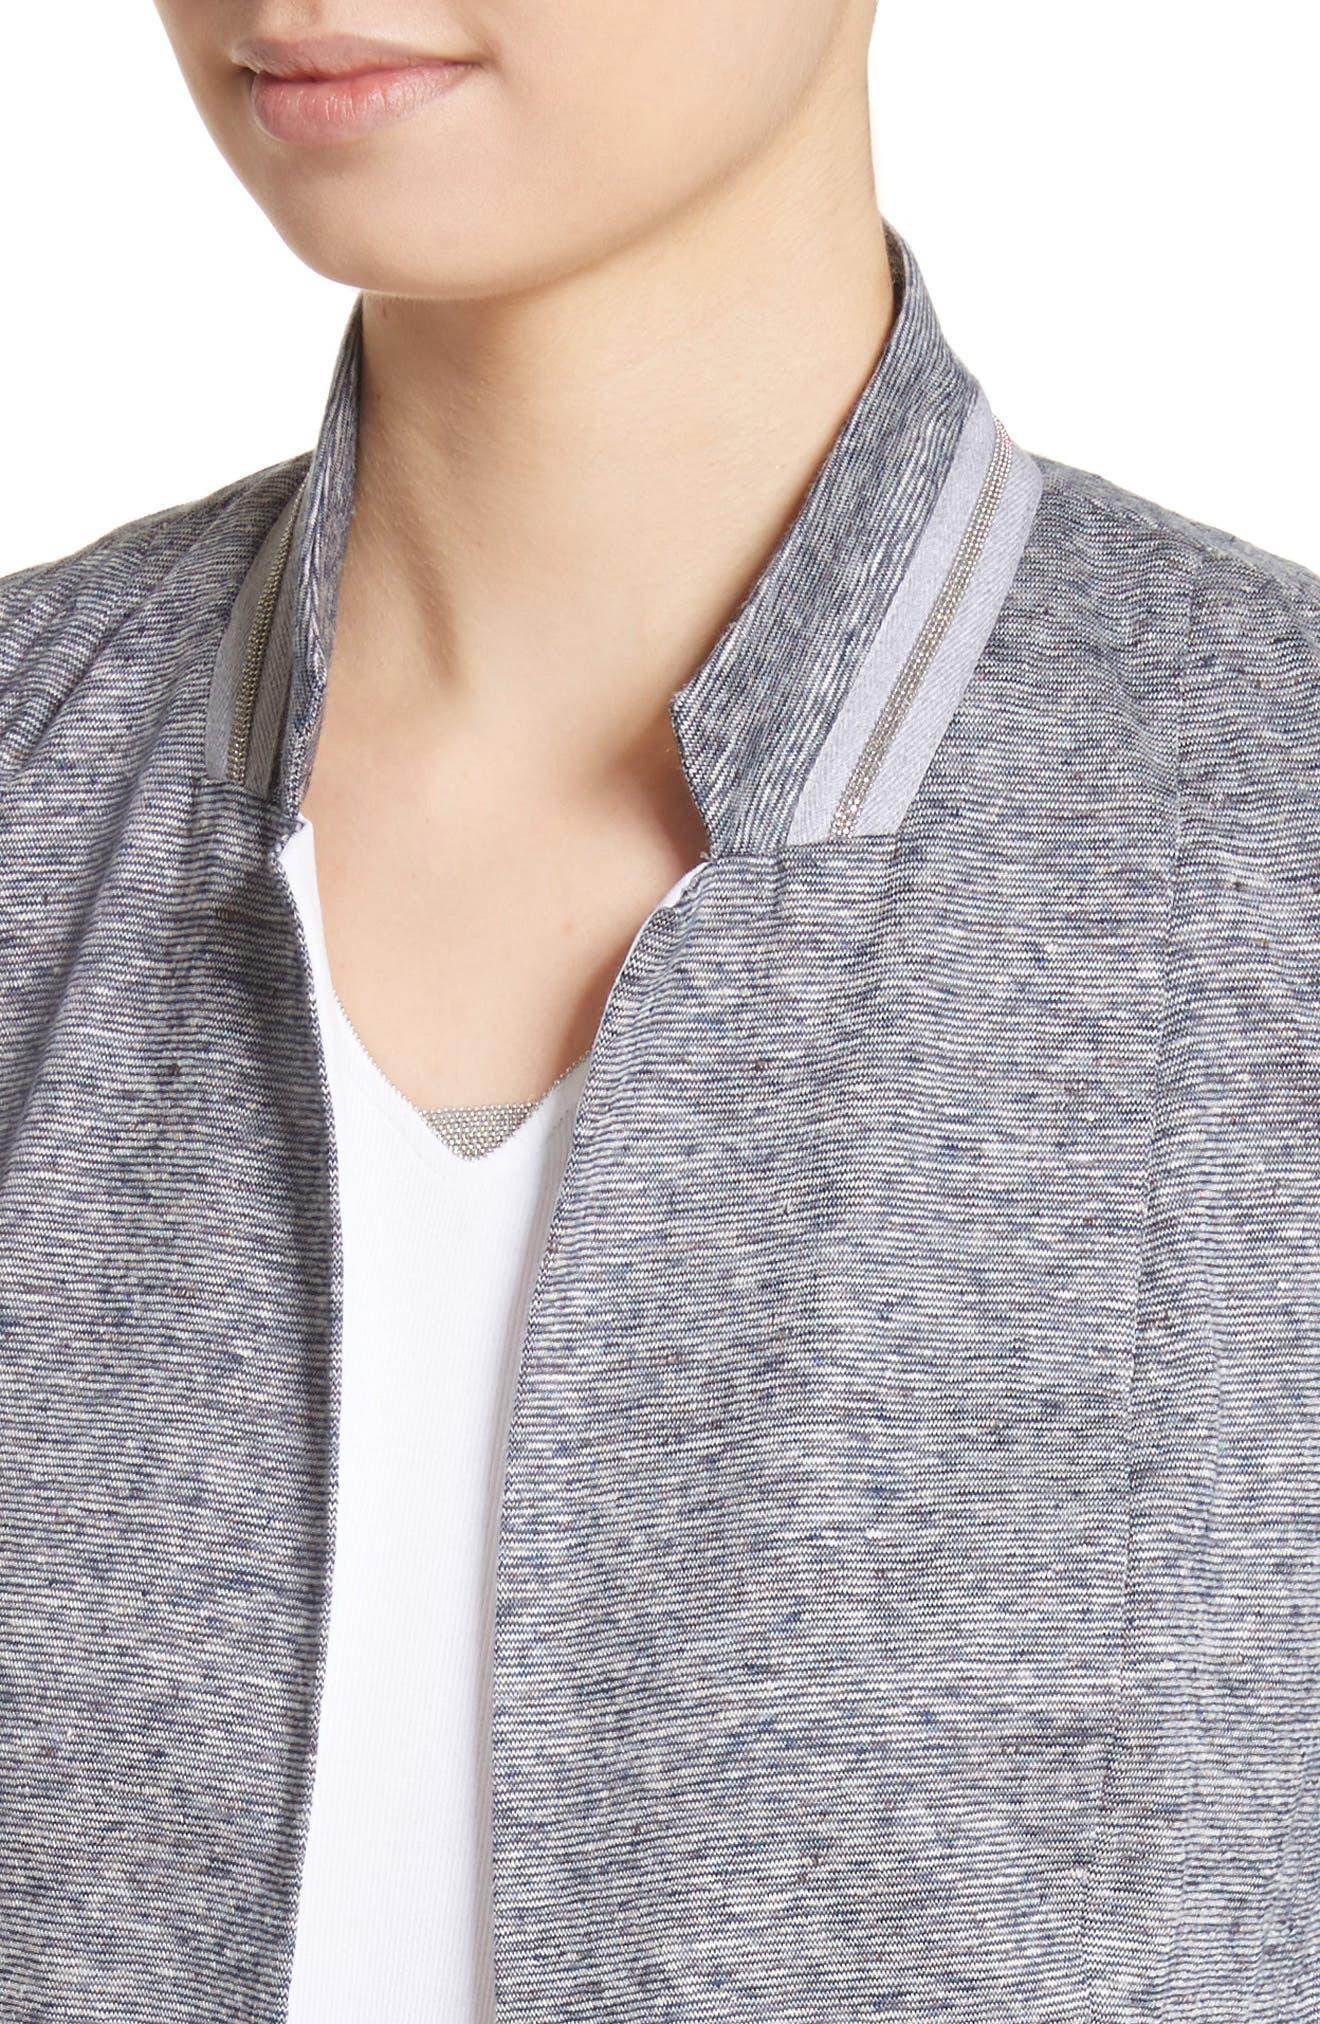 Grosgrain Stripe Jersey Jacket,                             Alternate thumbnail 4, color,                             400